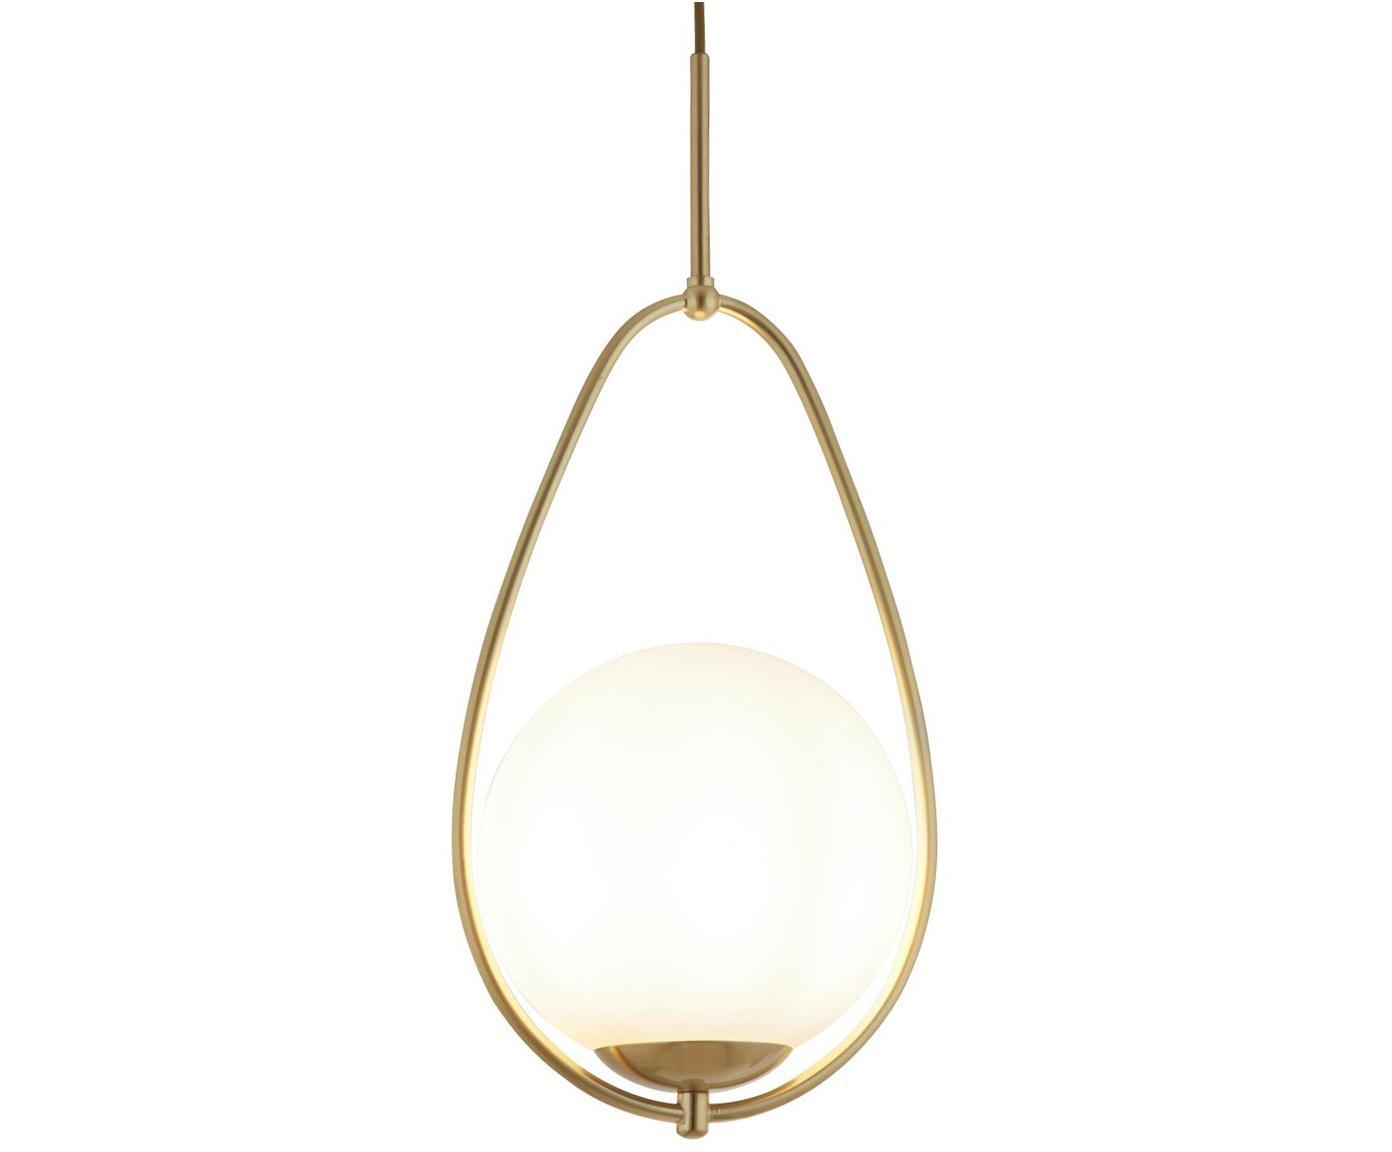 Lampada a sospensione in vetro opale Avalon, Paralume: vetro, Bianco, dorato, Ø 23 x Alt. 51 cm